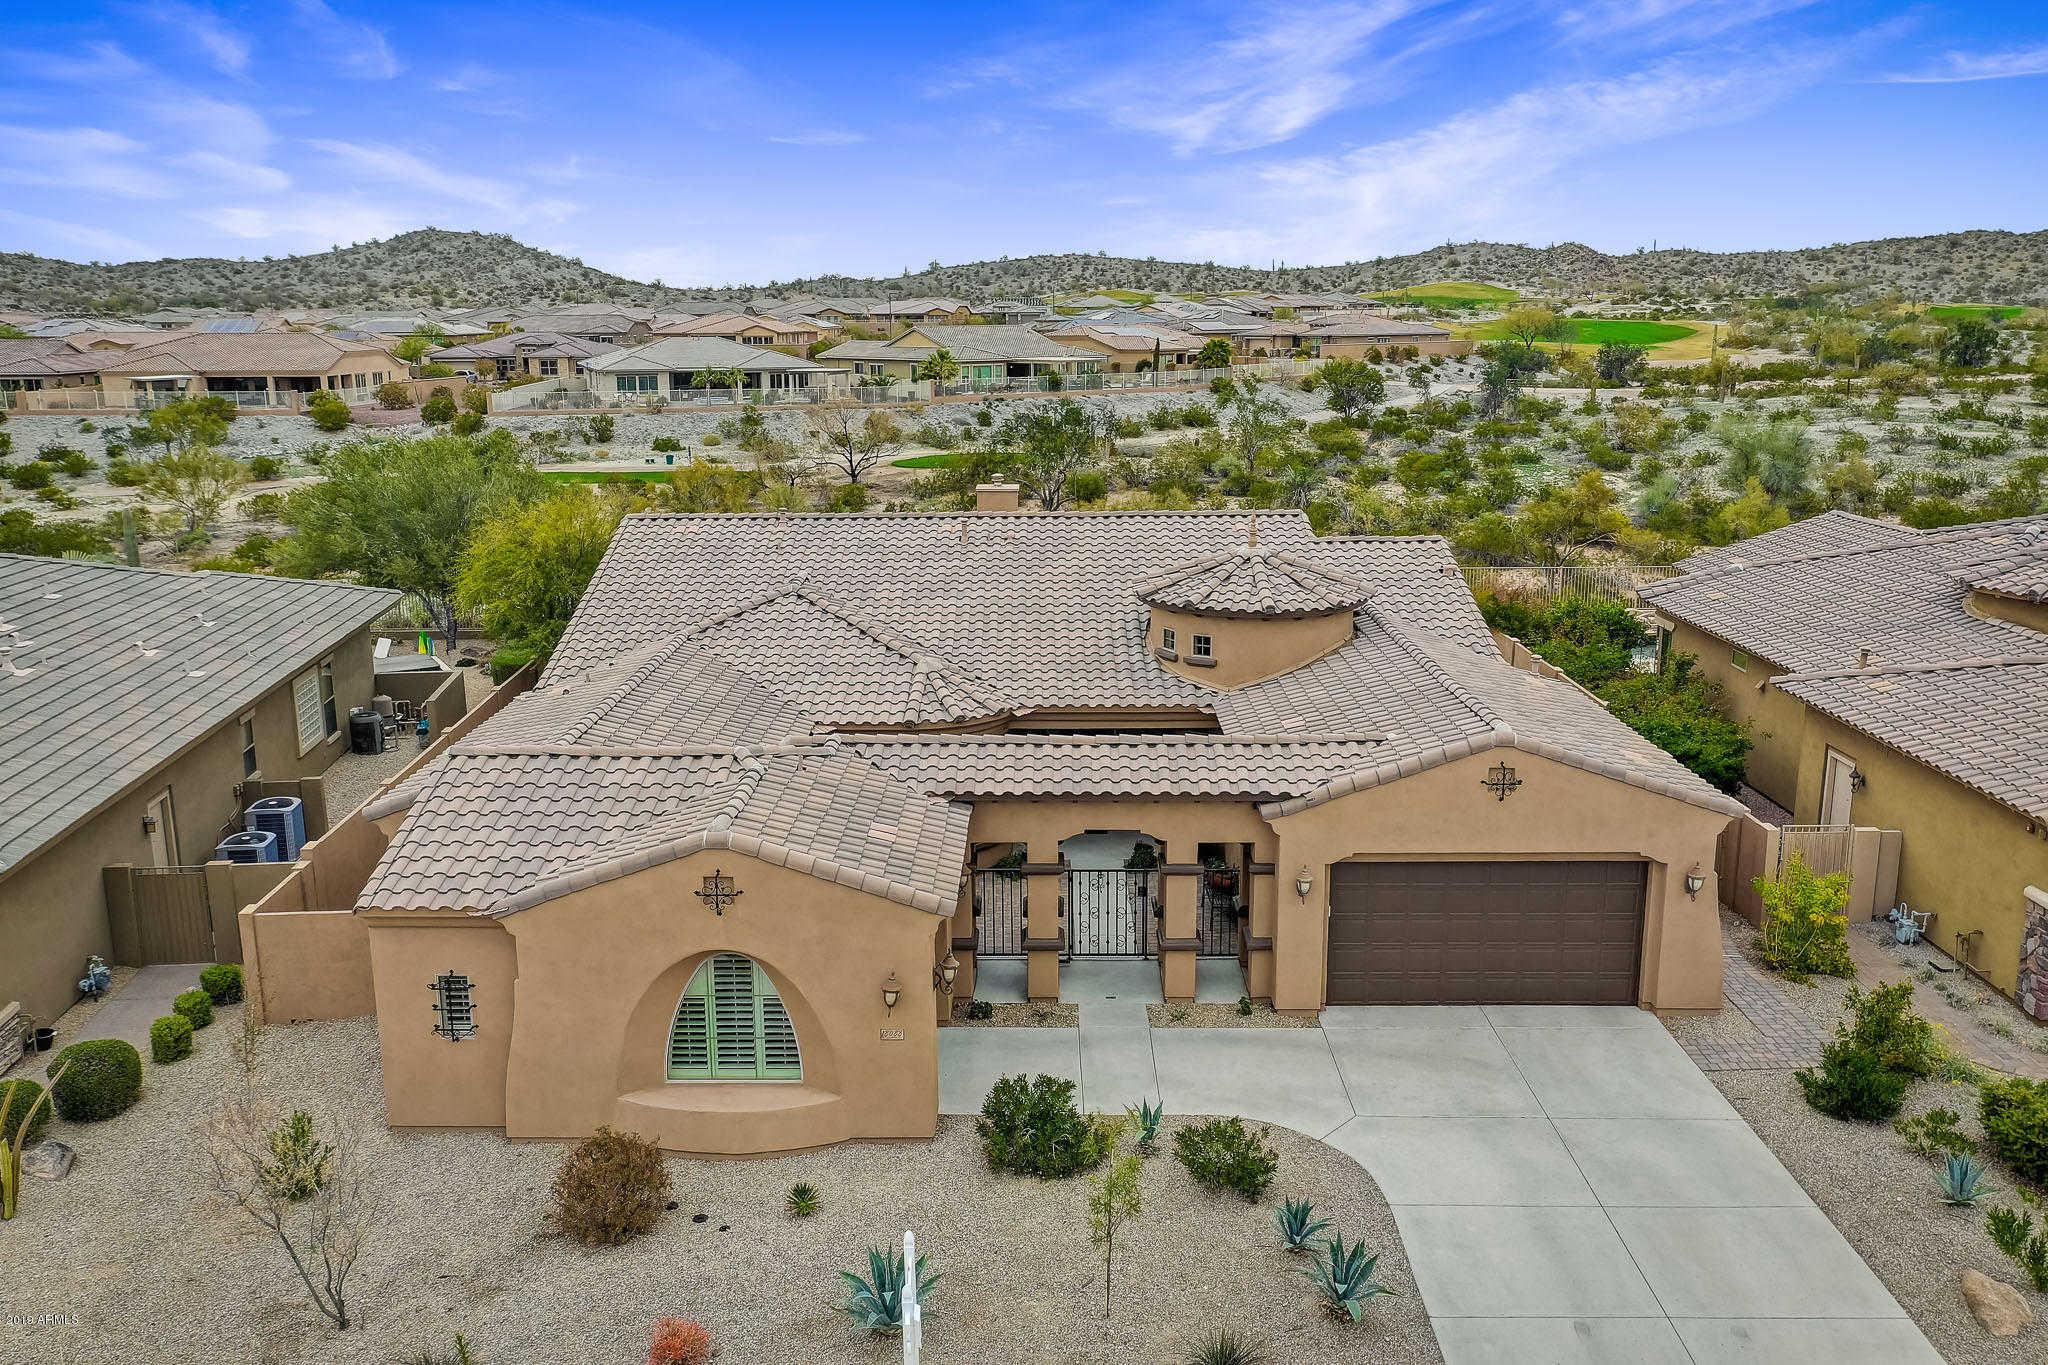 $567,000 - 4Br/4Ba - Home for Sale in Estrella Mountain Ranch Parcel 95a, Goodyear